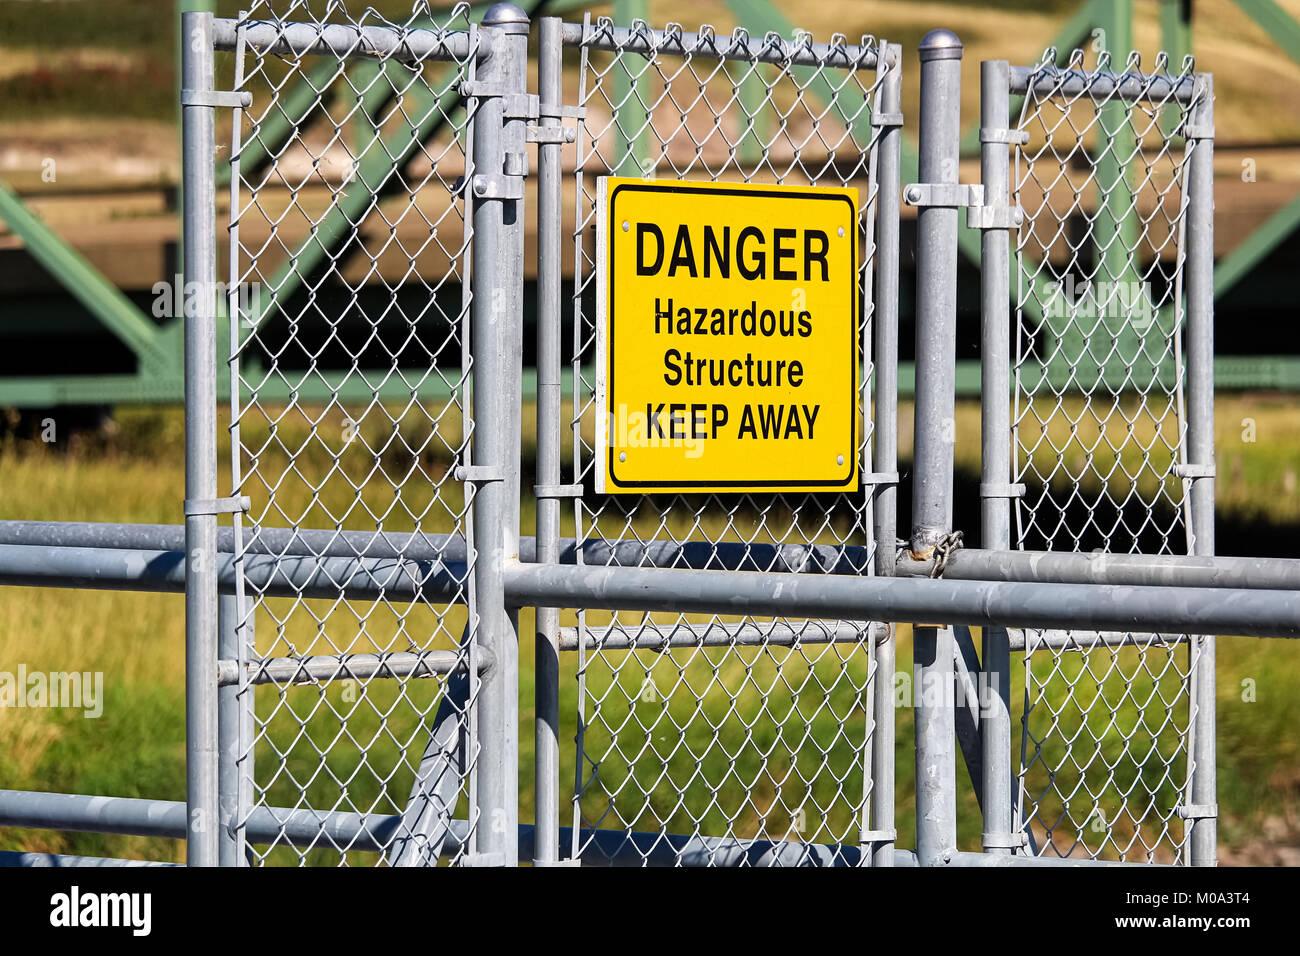 A Danger Hazardous Structure Keep Away sign - Stock Image